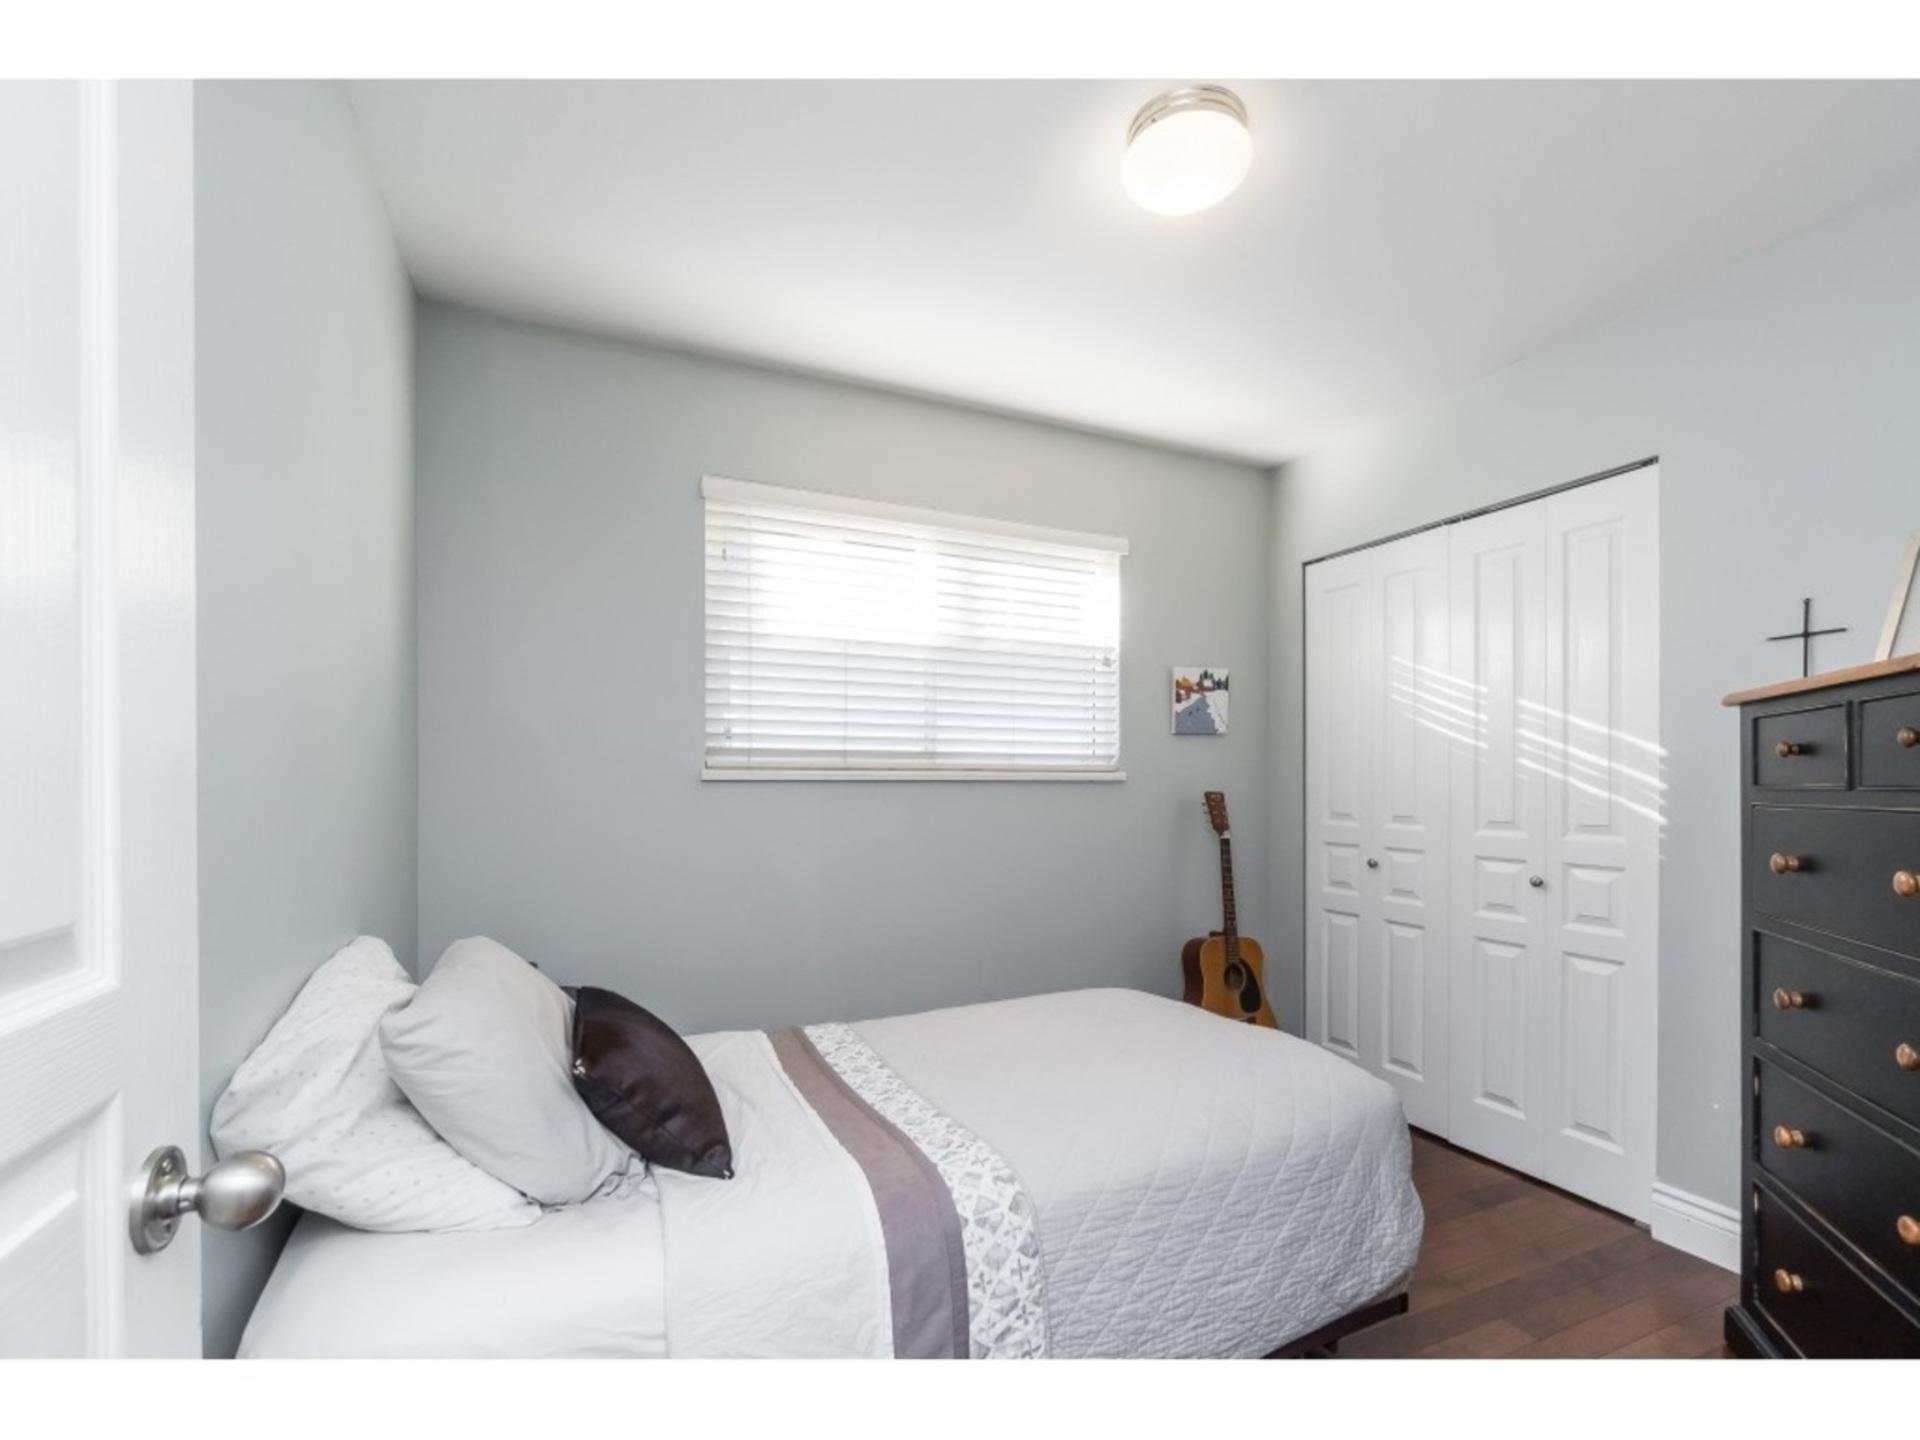 18457-65-avenue-cloverdale-bc-cloverdale-11 at 18457 65 Avenue, Cloverdale BC, Cloverdale